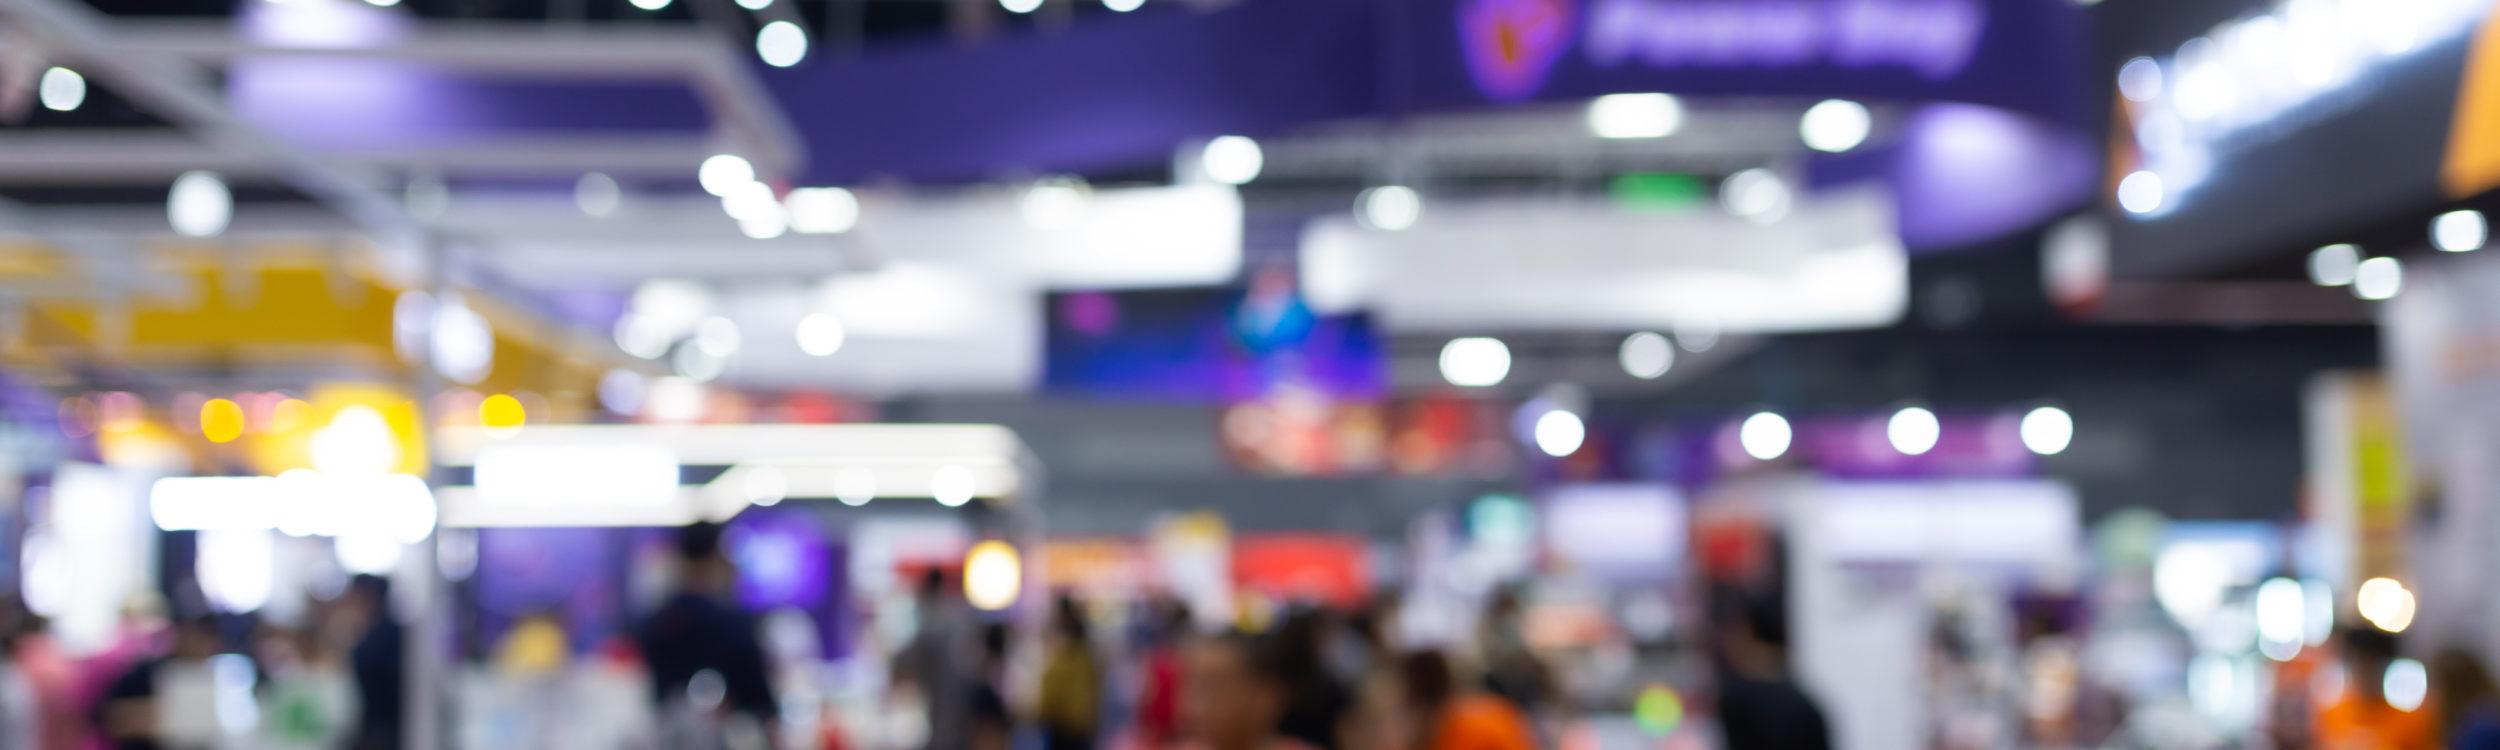 NRF 2021: Retail's Digital Transformation Reckoning featured image